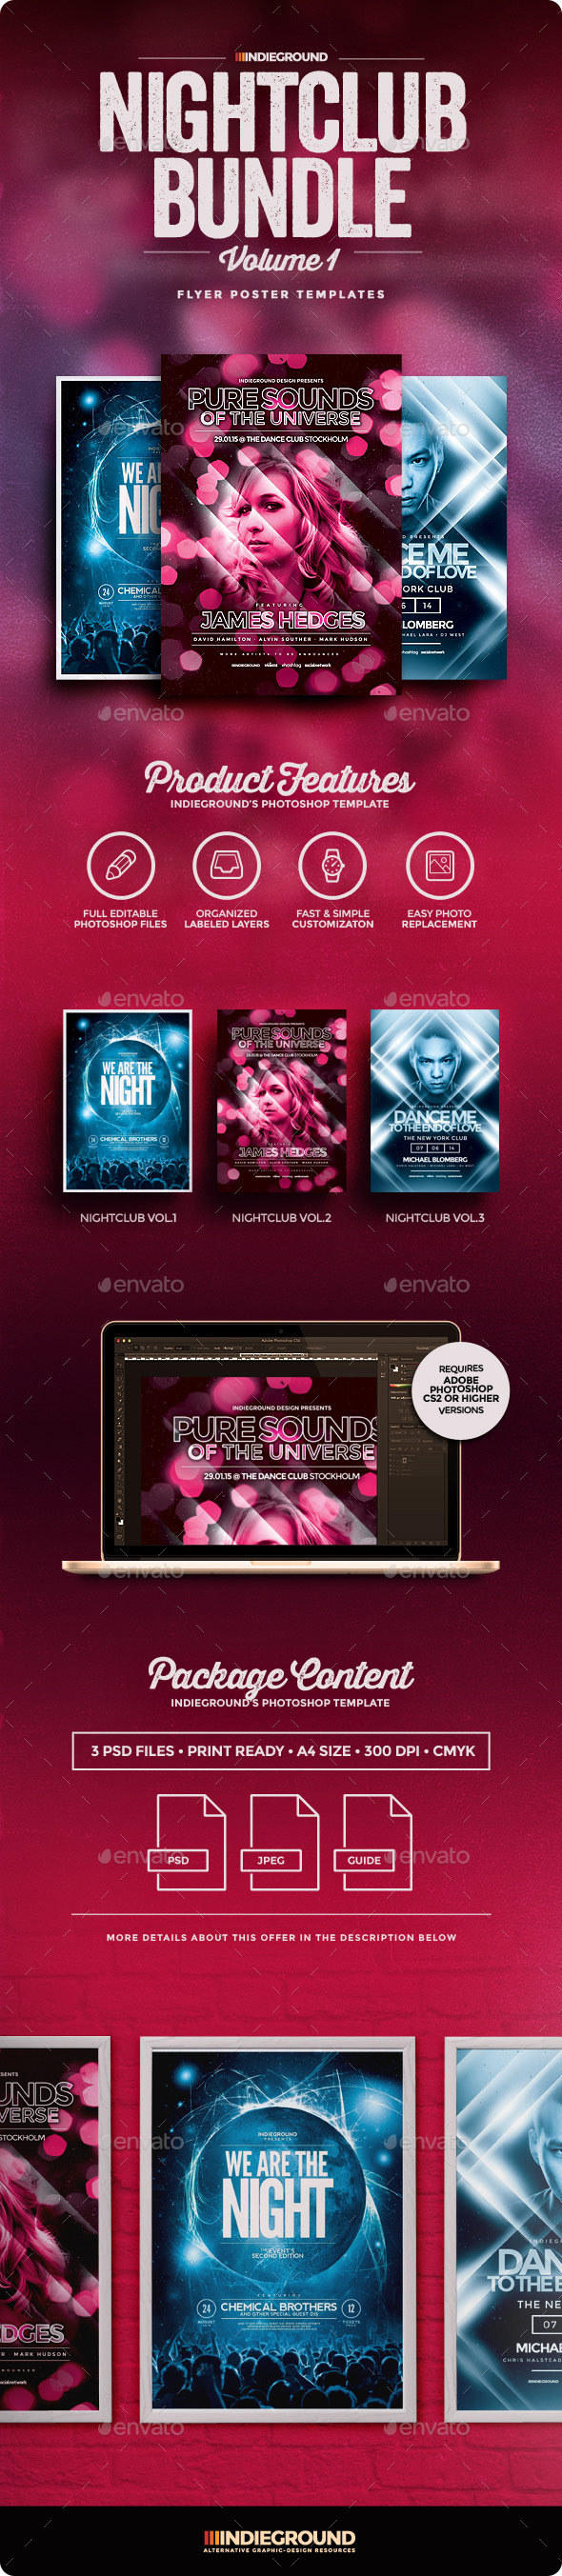 Nightclub Flyer/Poster Bundle Vol. 1-3 - Clubs & Parties Events